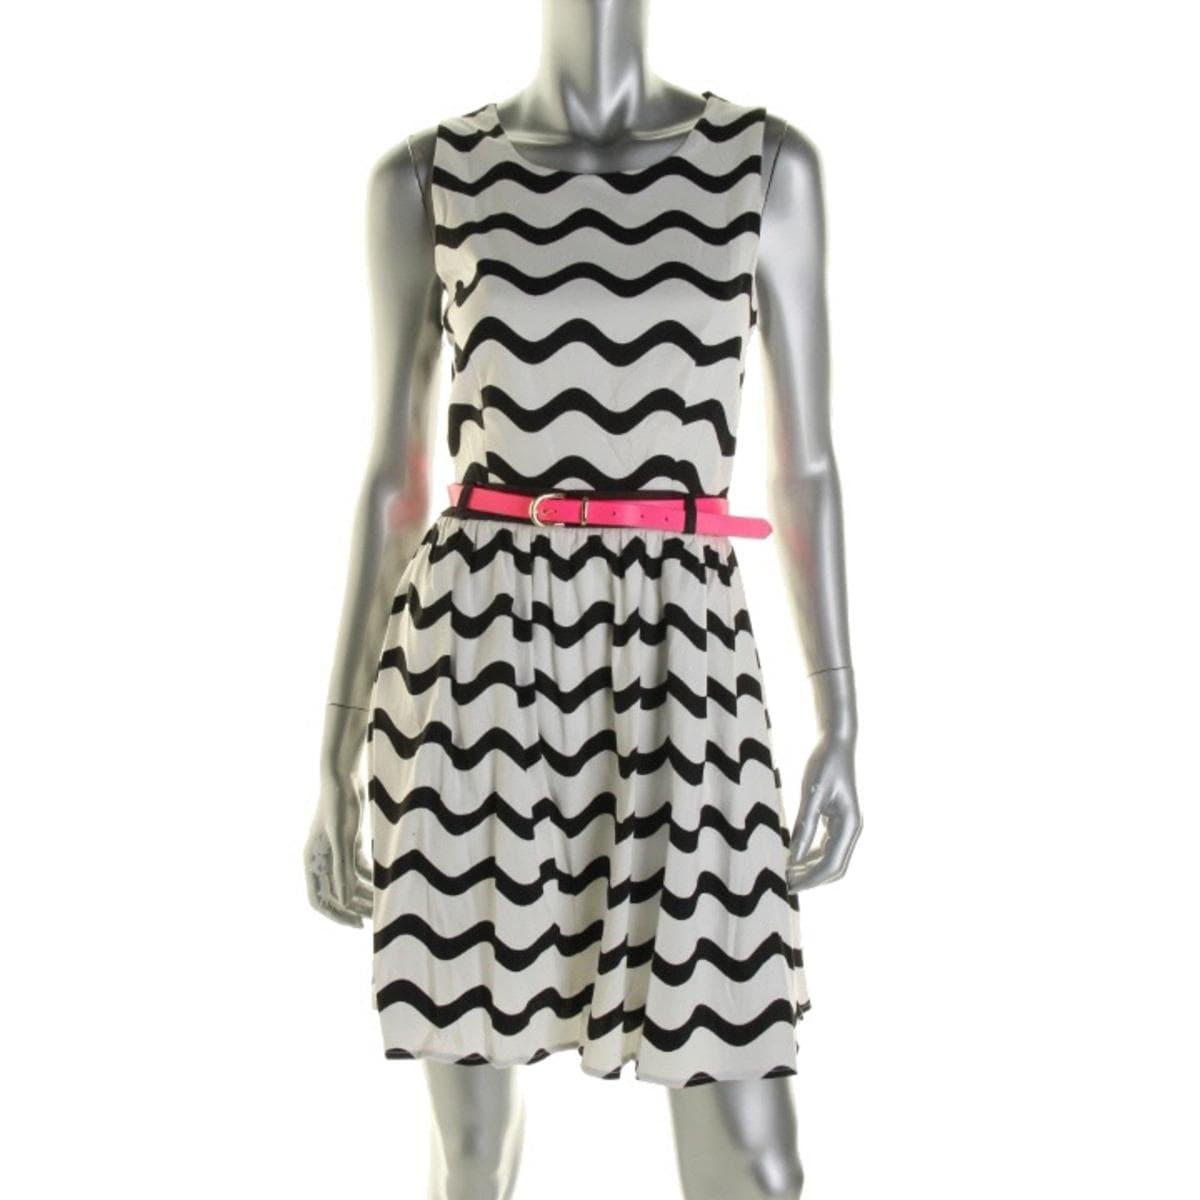 Shop City Studio Womens Juniors Casual Dress Striped Sleeveless - 9 - Free  Shipping On Orders Over  45 - Overstock.com - 19989999 b4b0fb9b6